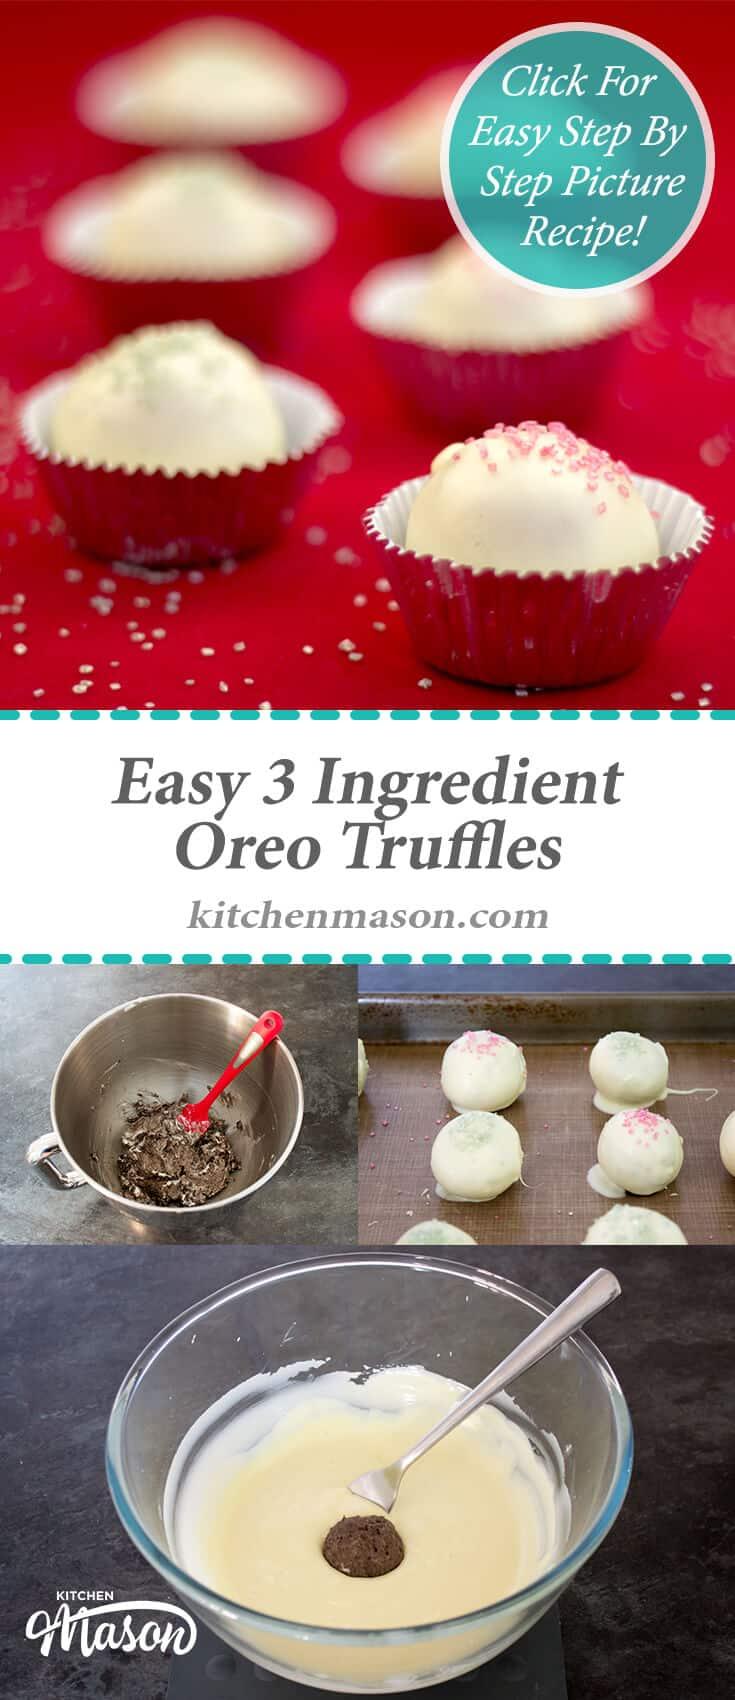 Easy 3 Ingredient Oreo Truffles White Chocolate Christmas Gift